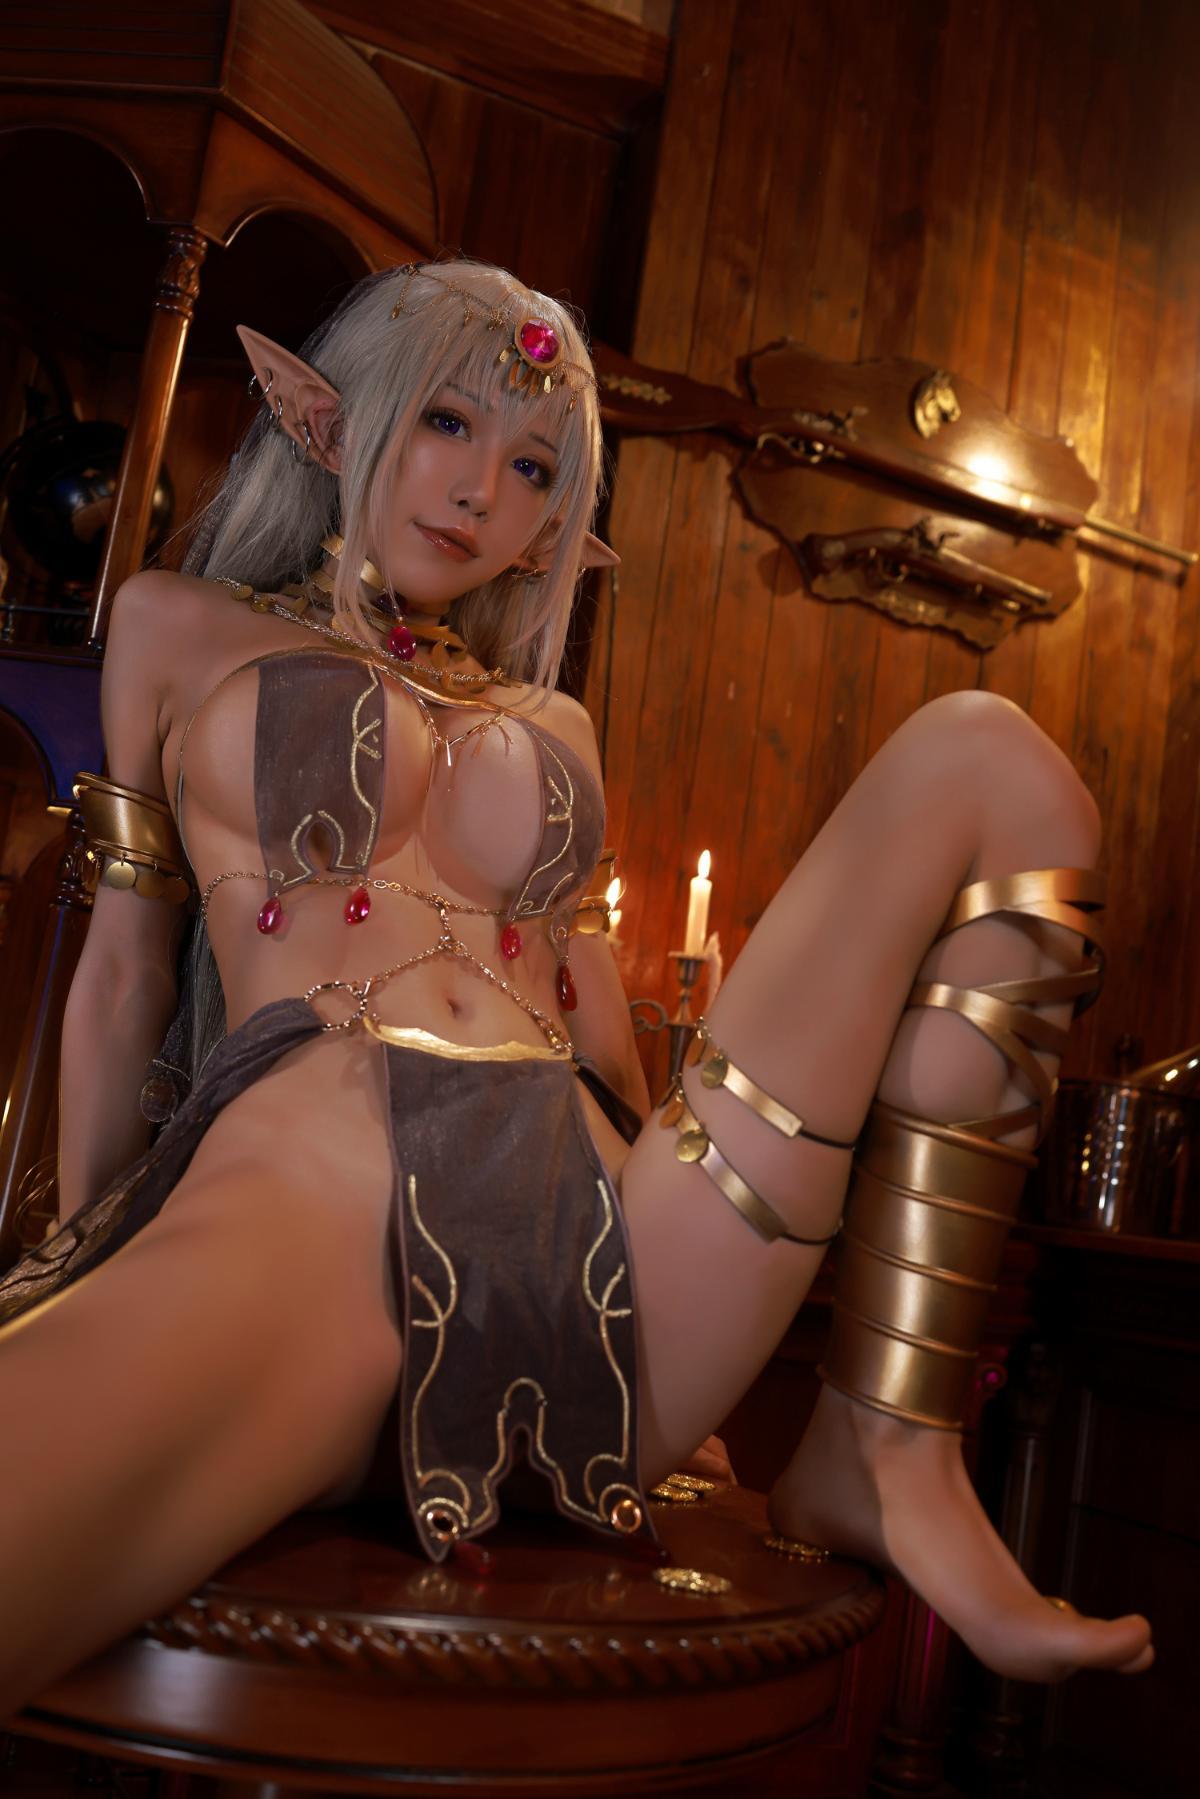 Tan Dancer Elf Succubus Cosplay by Aqua 18